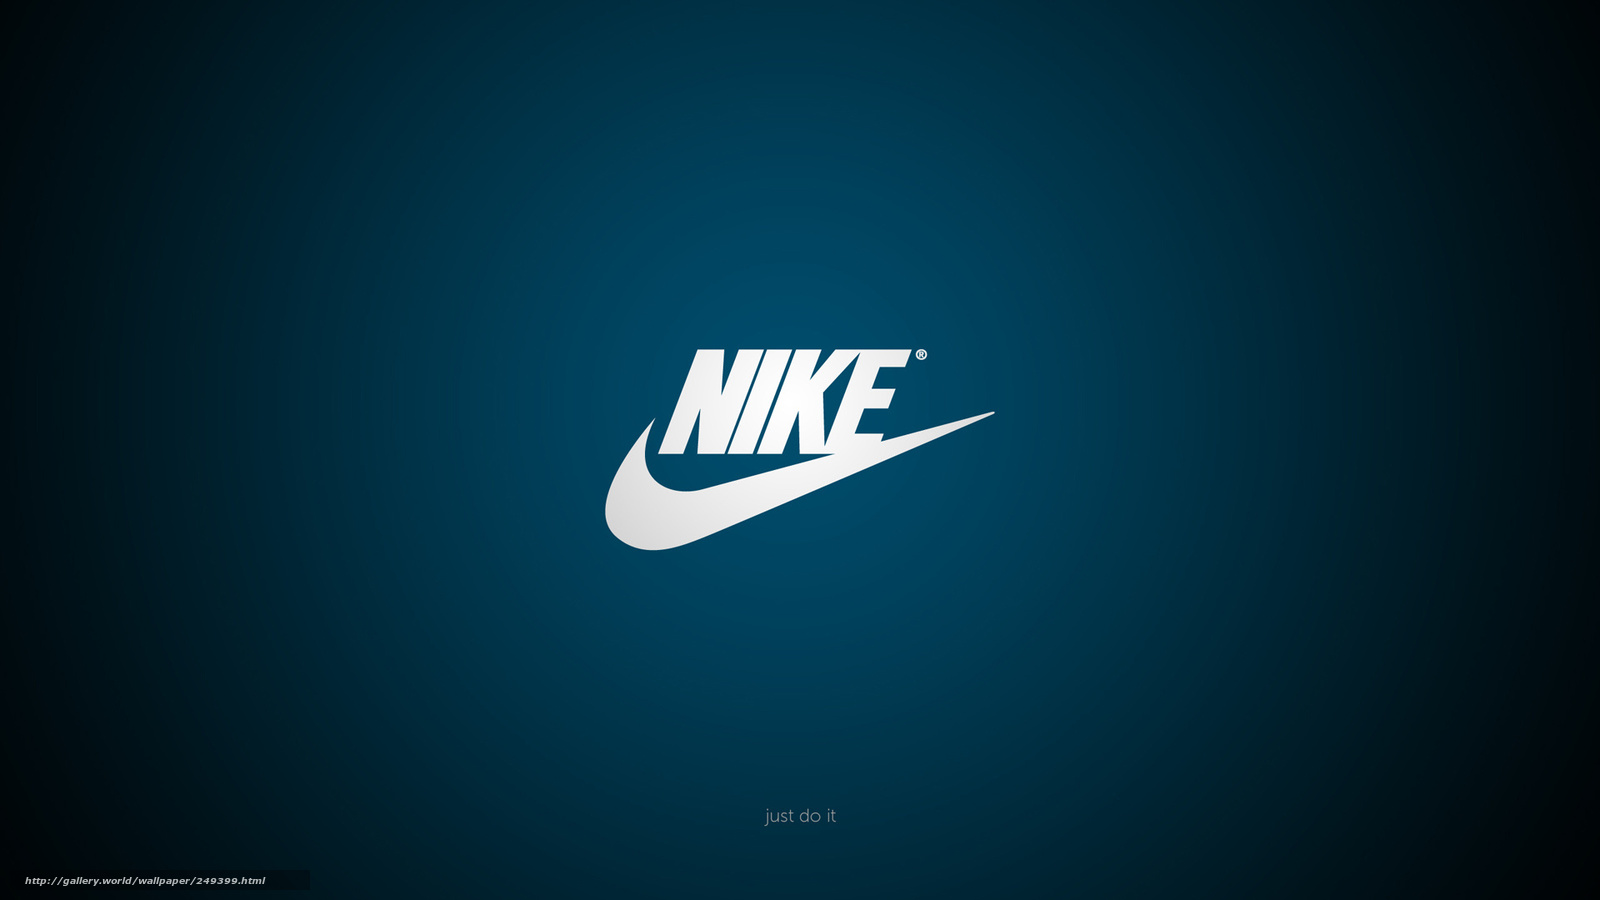 249399_nike_-company_-najk_-logo_-logoti